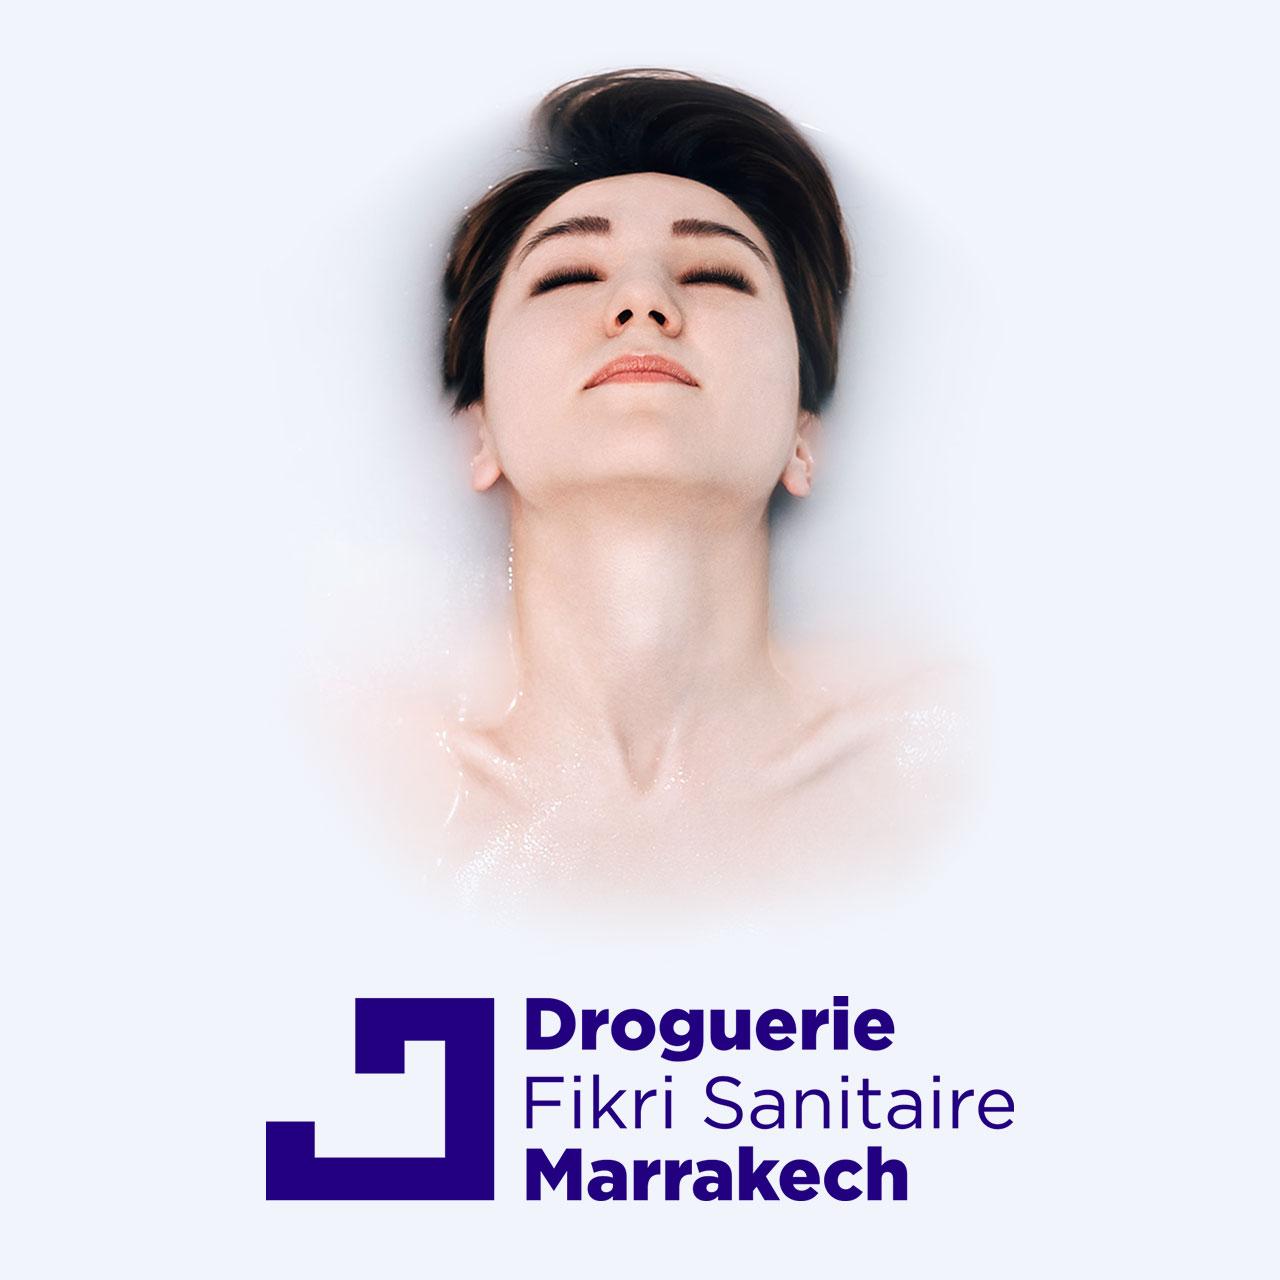 Droguerie Fikri Sanitaire Marrakech's homepage thumbnail